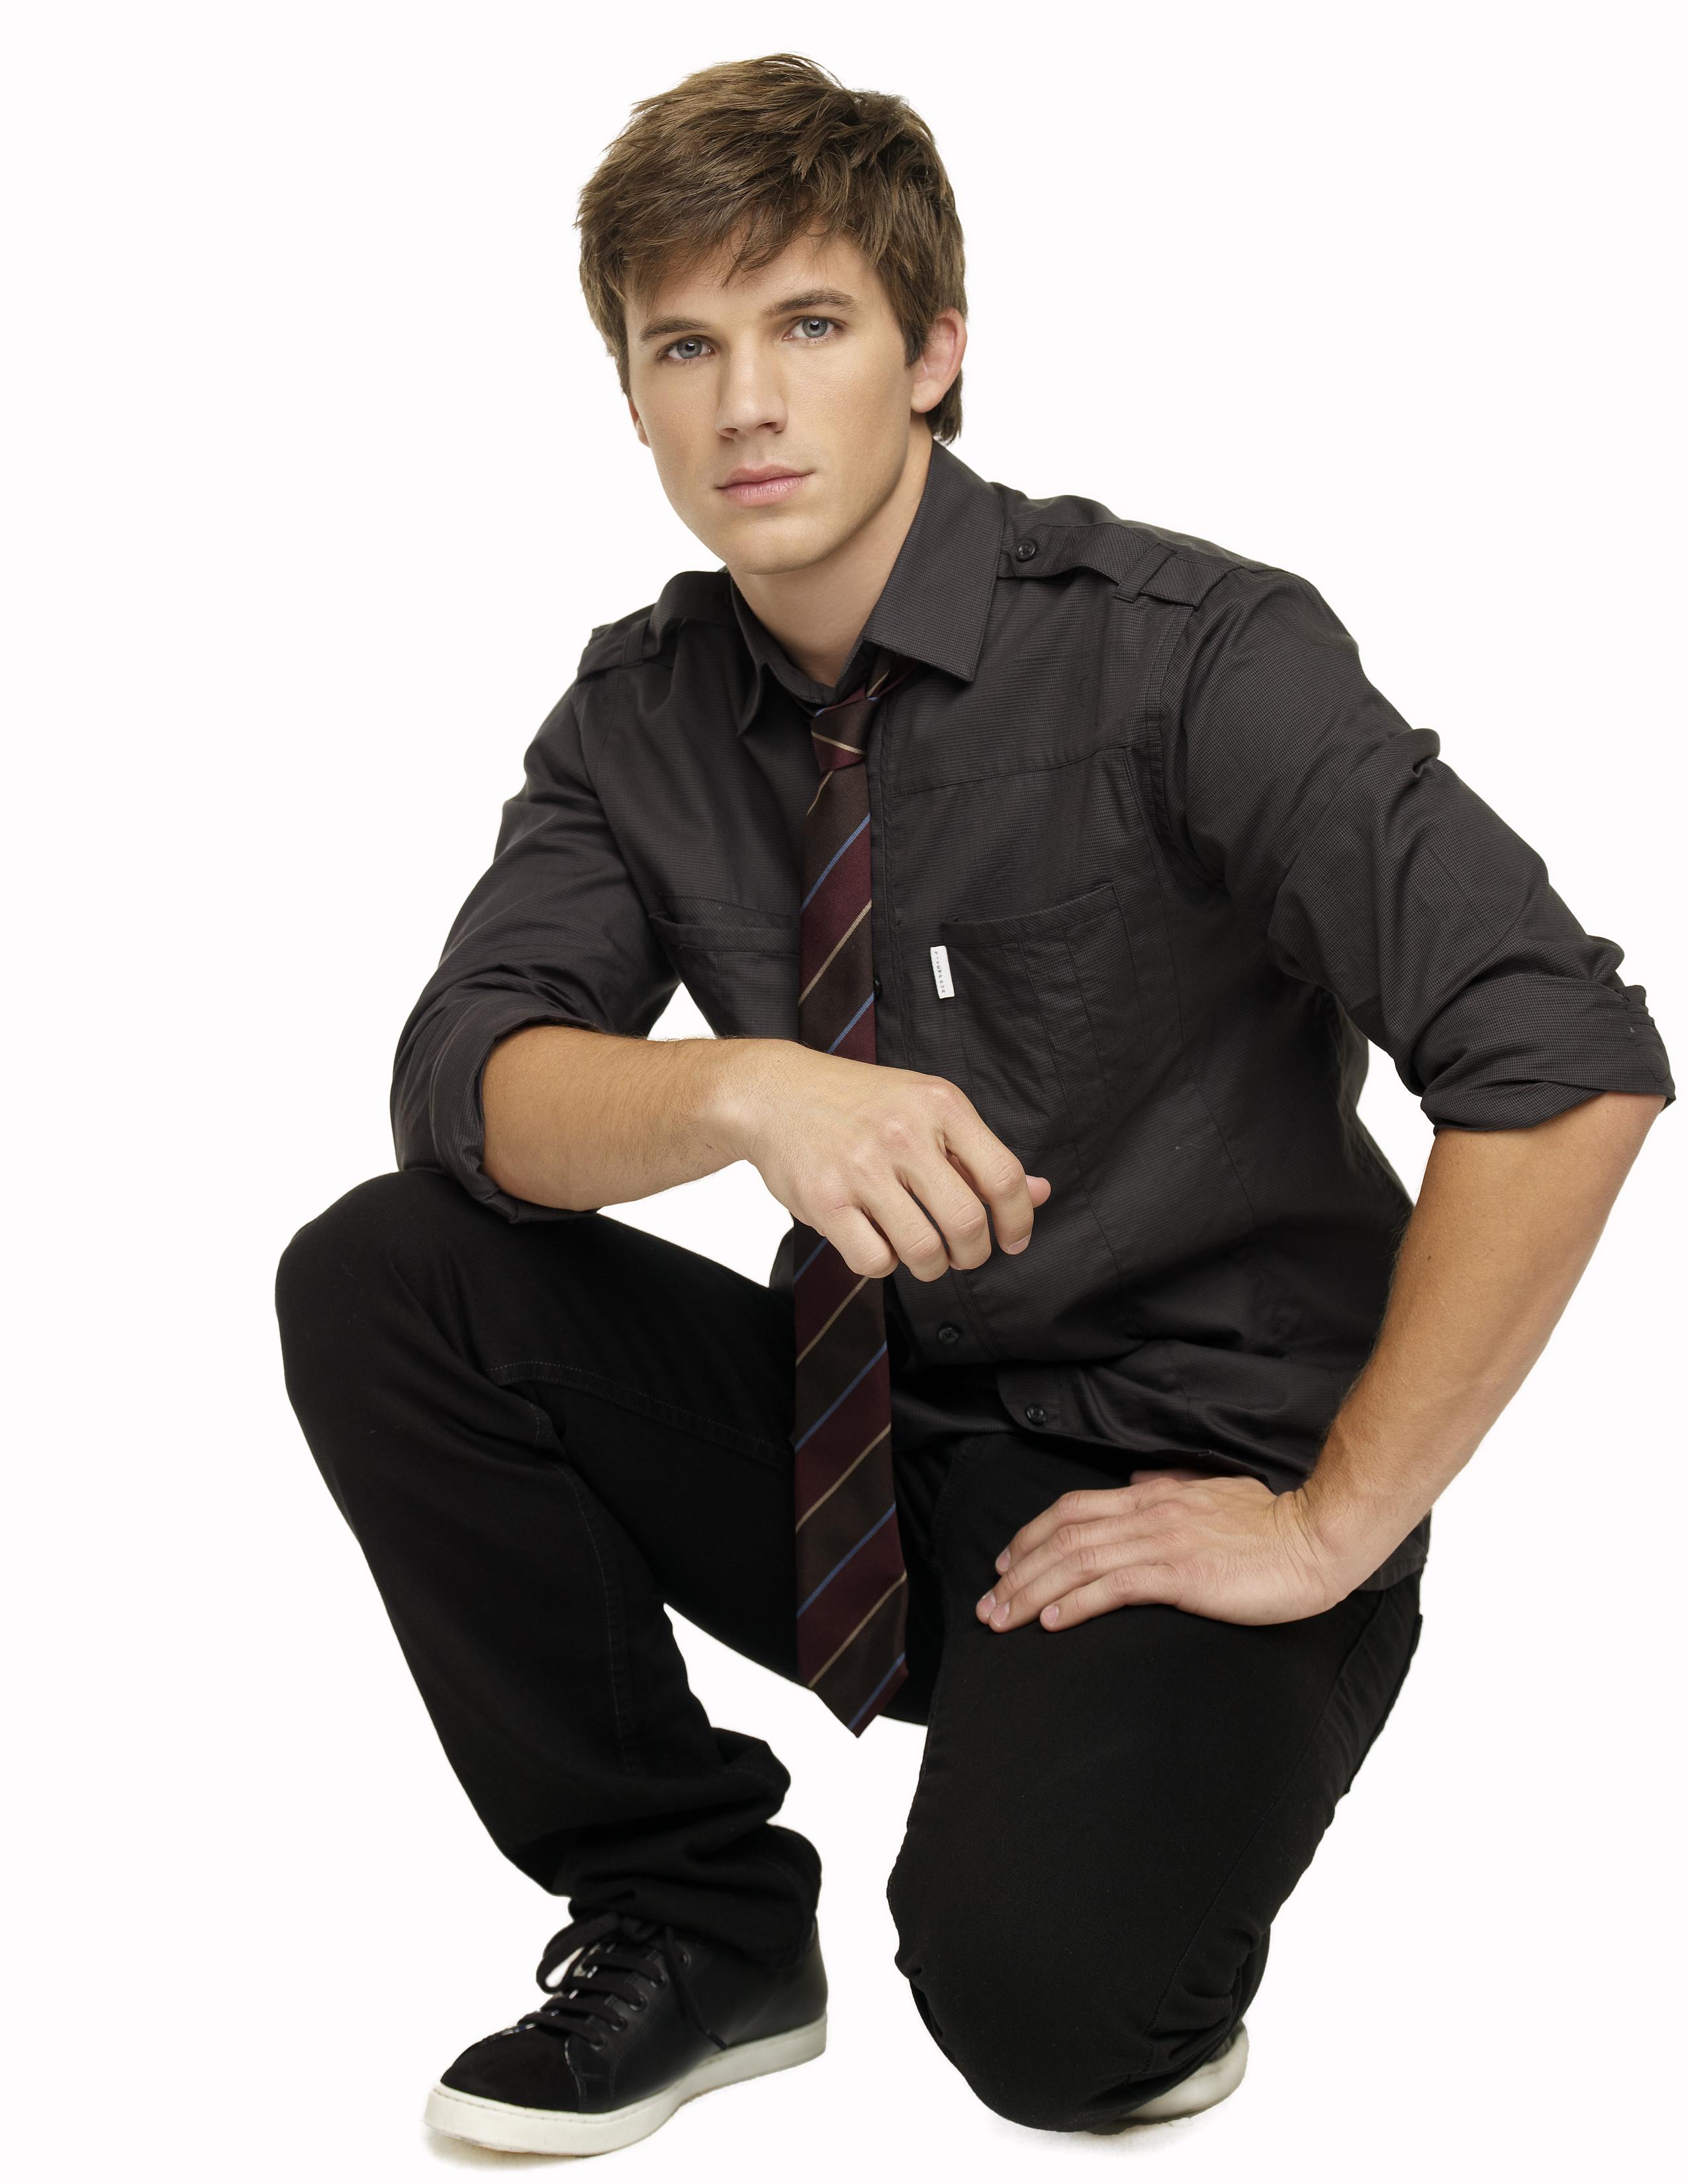 Matt Lanter From 90210